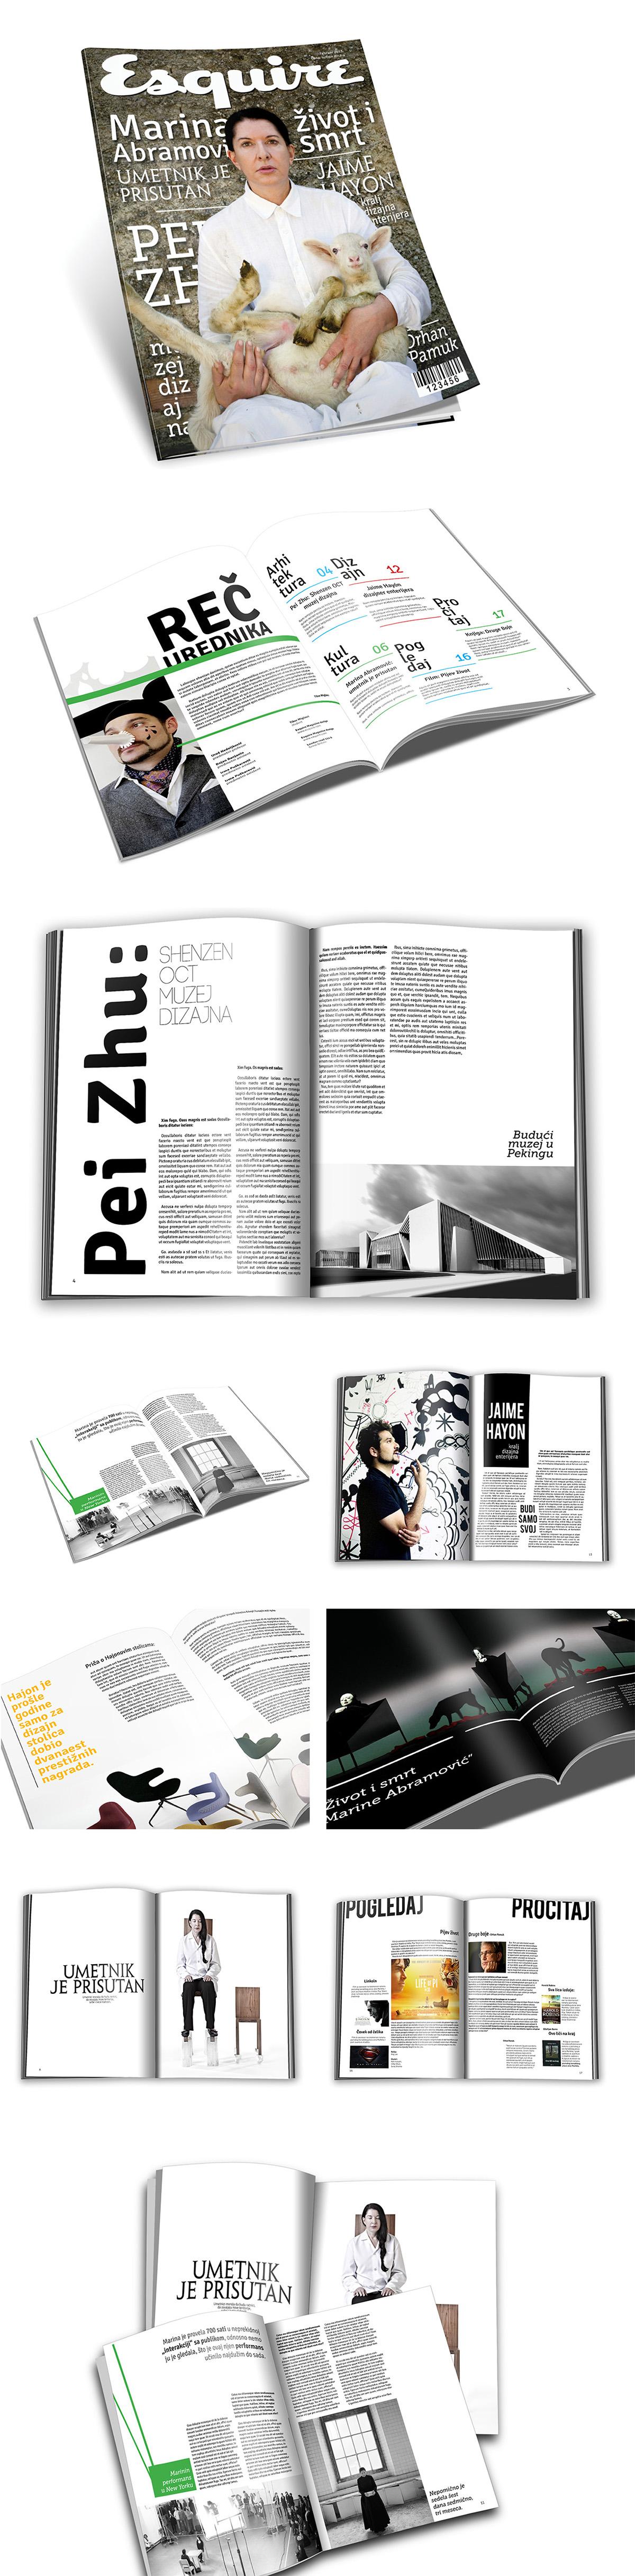 Esquire magazine marina abramovic pei zhu  Jaime Hayon design